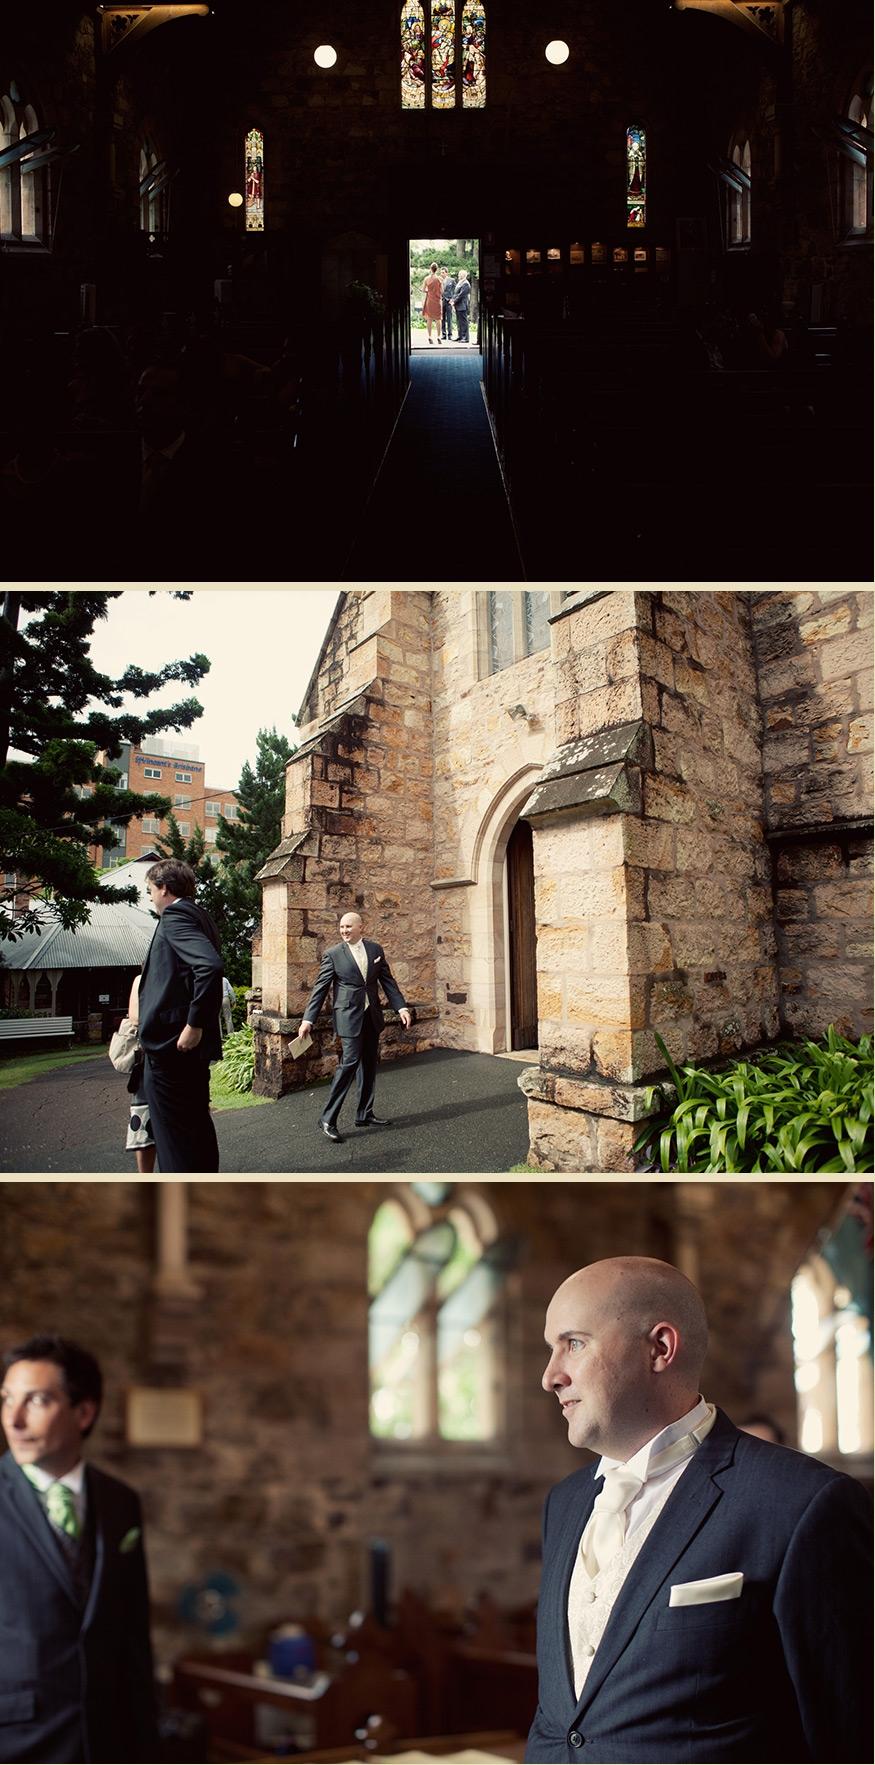 Brisbane Wedding Phoographer Blog-collage-1332892810616